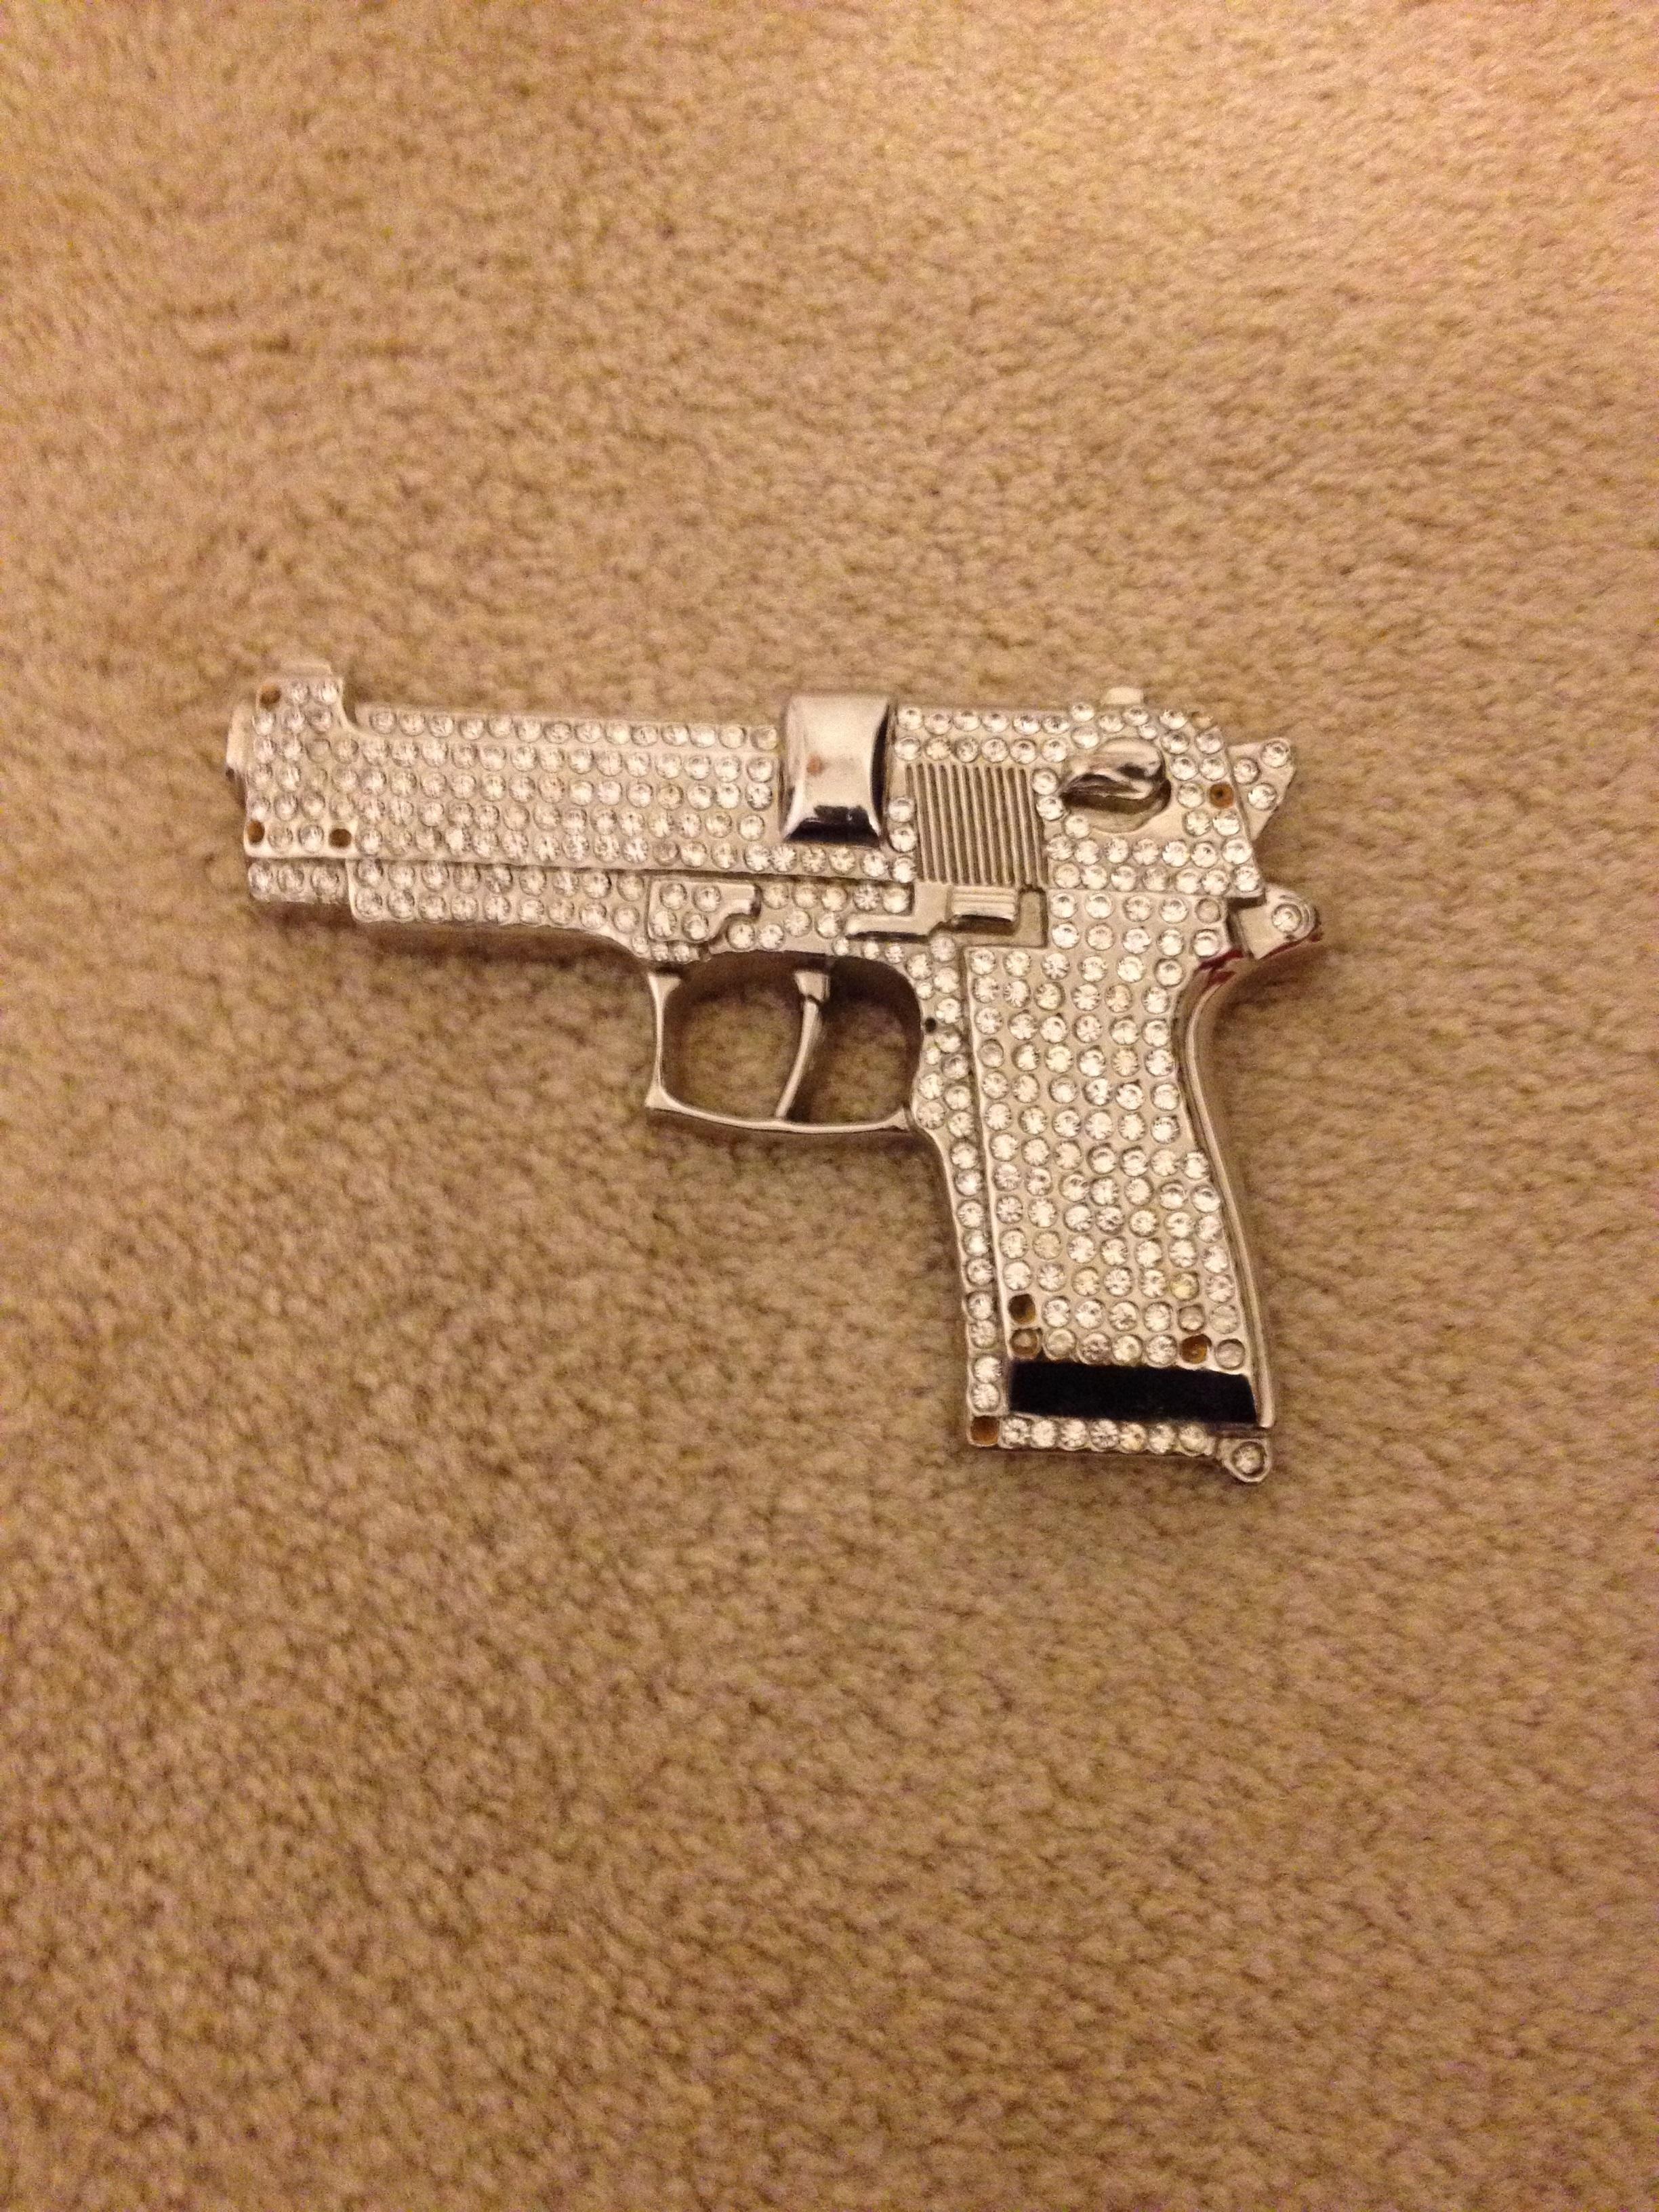 Badazzled gun